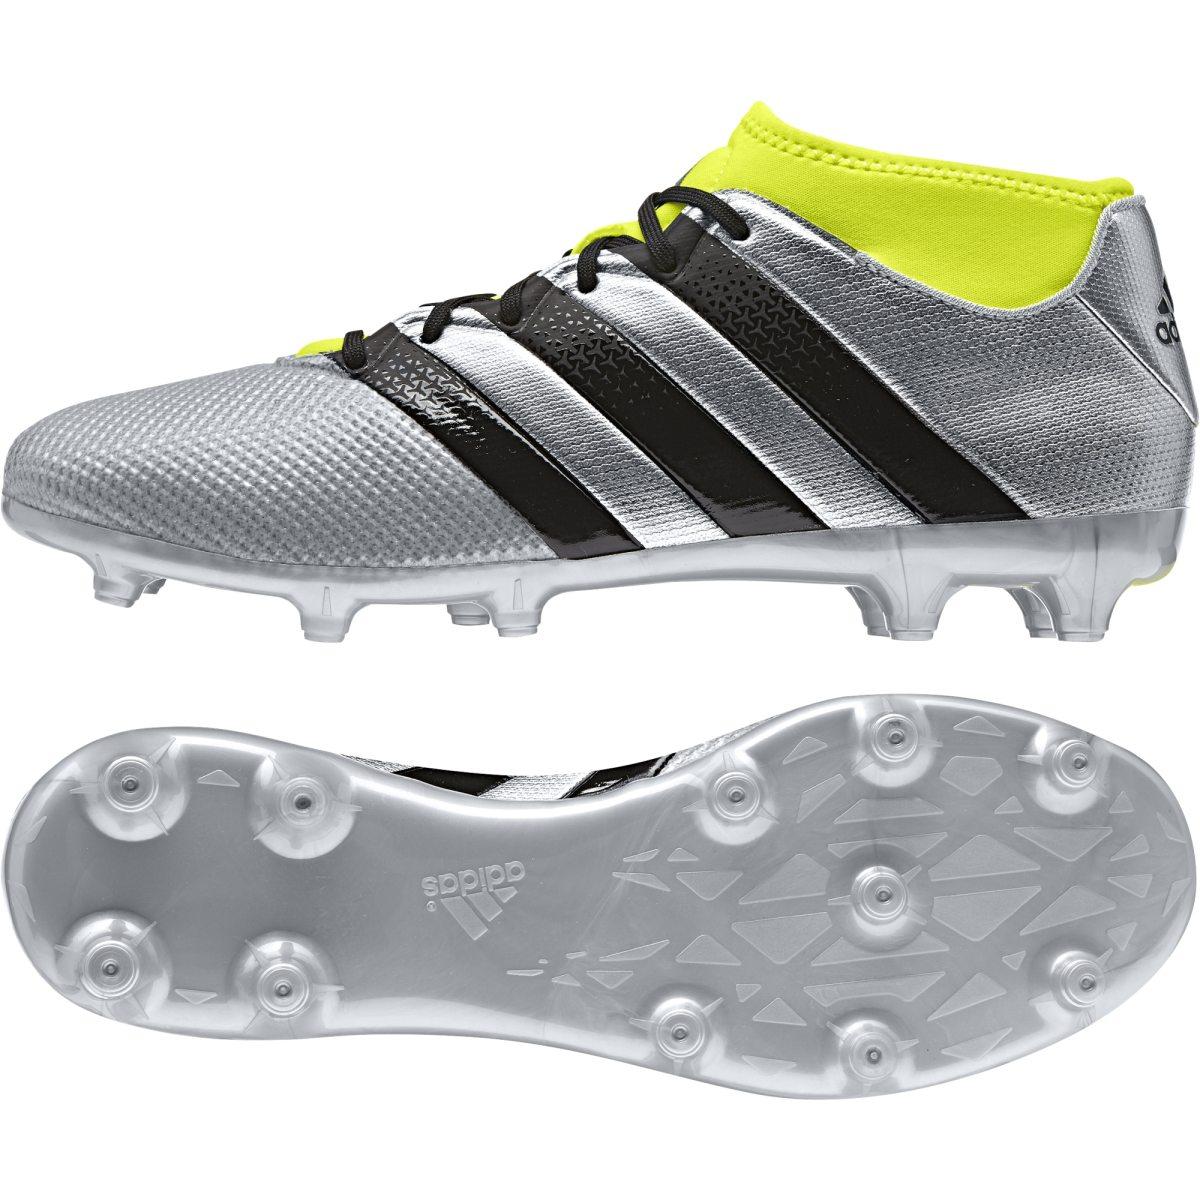 adidas ace 16.3 primemesh fg ag ec fotbollssko senior fotbollsskor 2c2df3ba9ff47